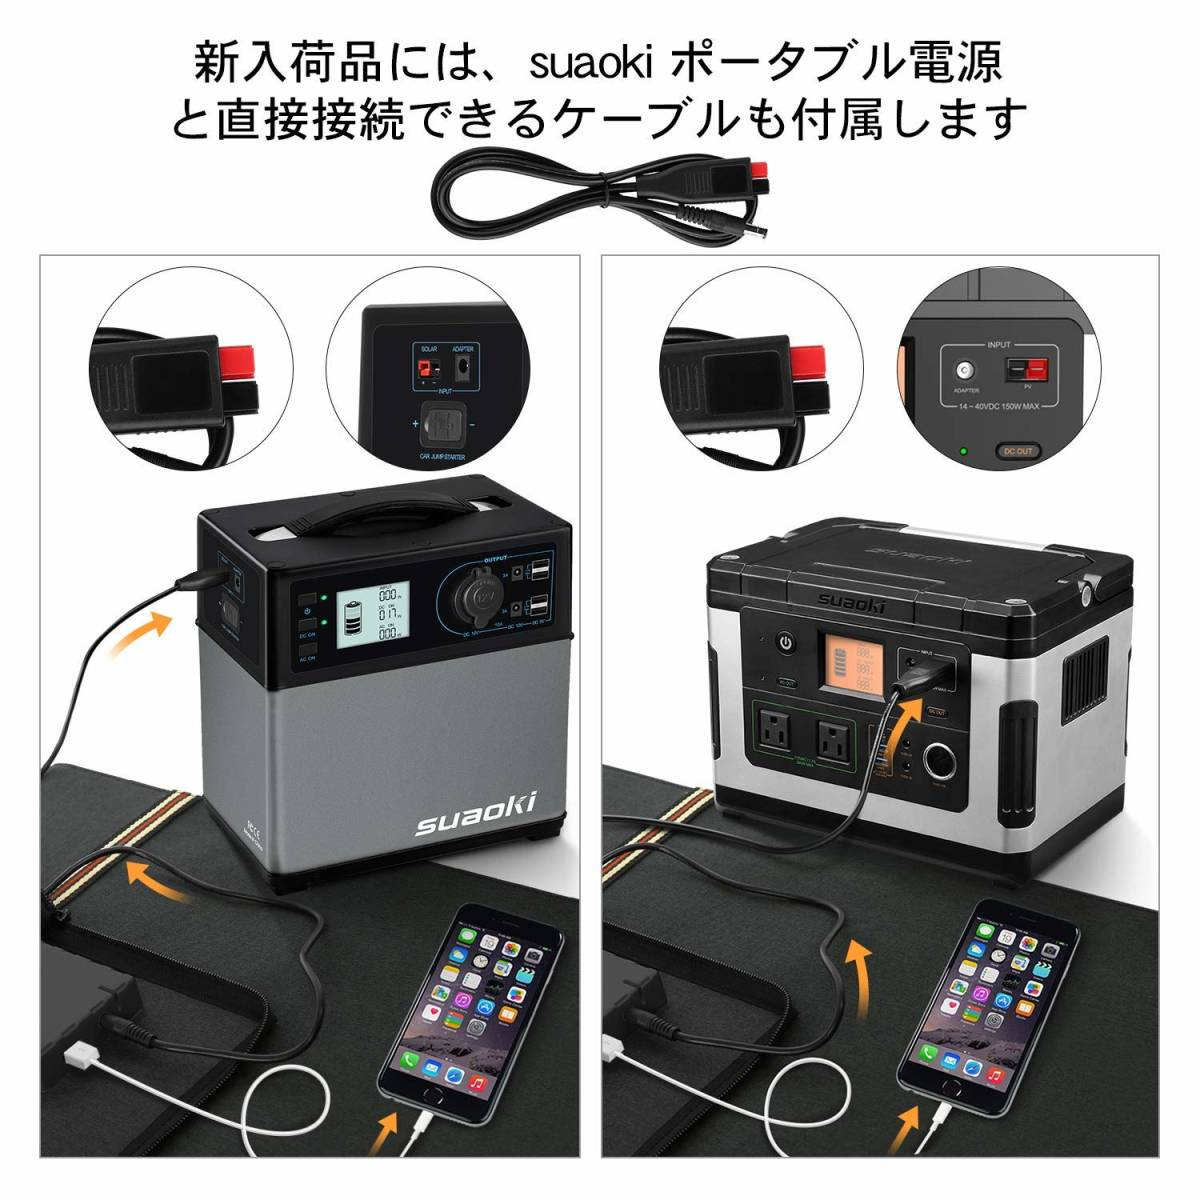 suaokiソーラーチャージャー 100W ソーラーパネル 高変換効率 折りたたみ式 USB DC(18V)出力端子 ソーラー充電器 防災 非常用_画像2